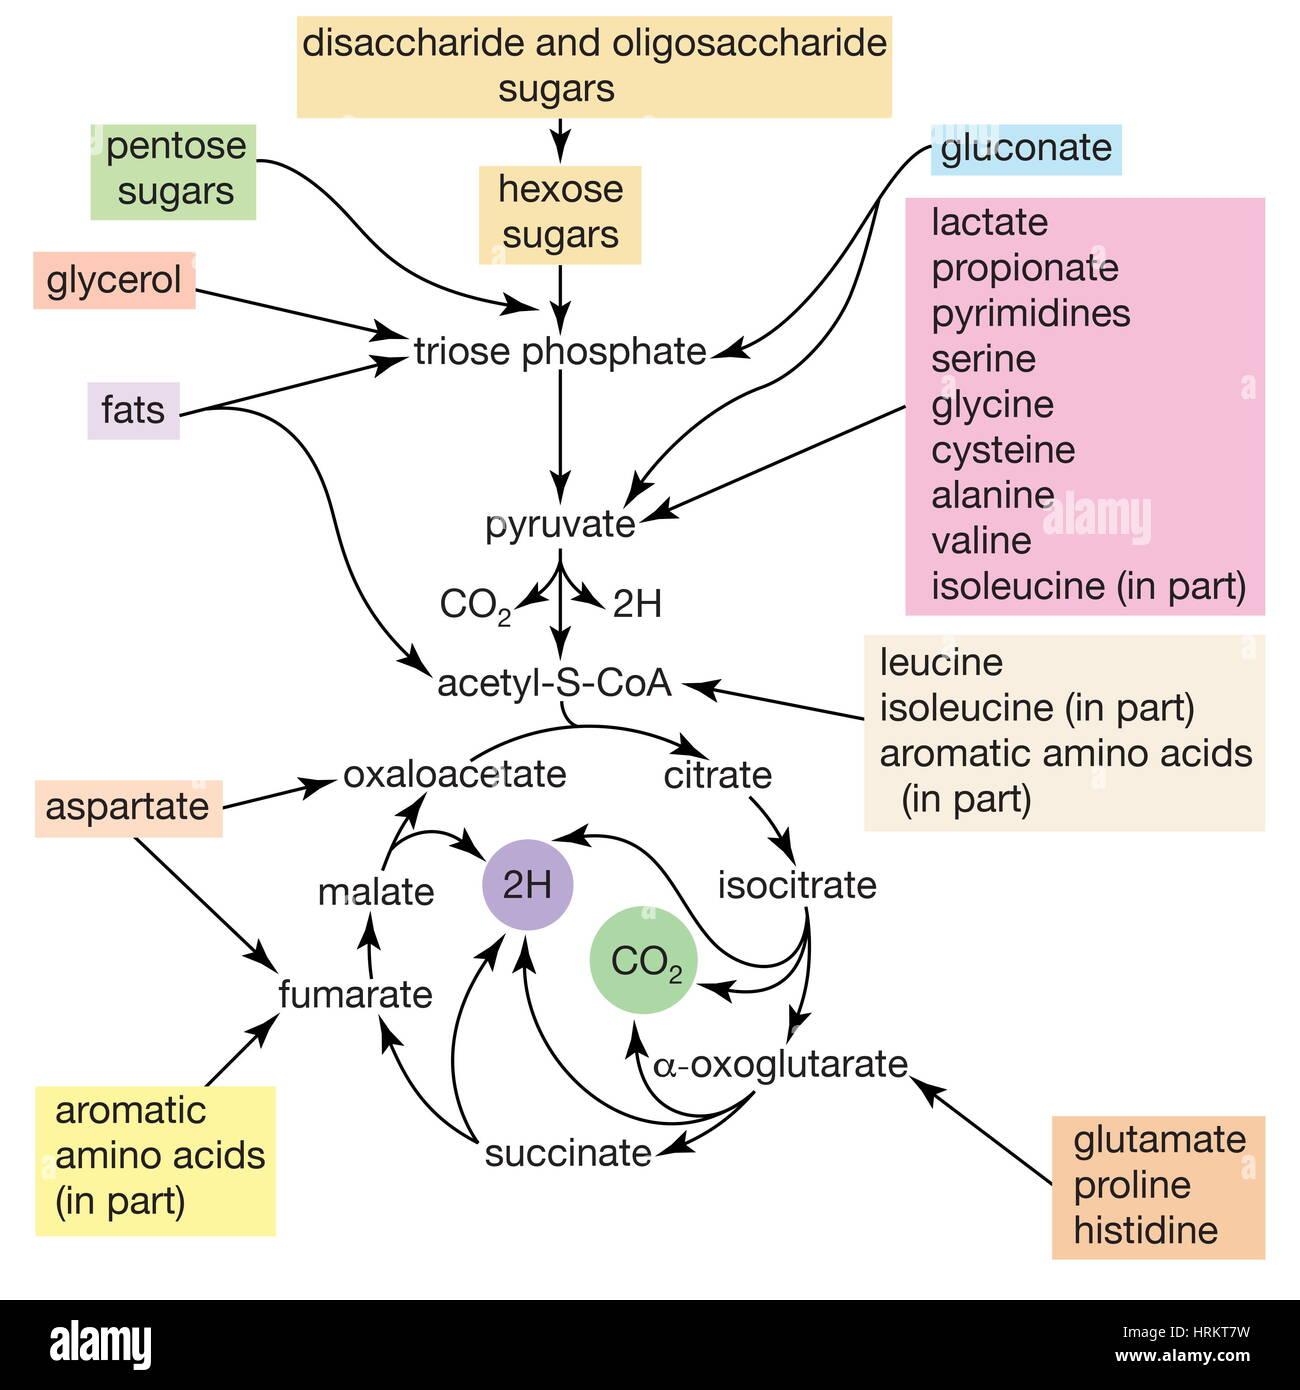 Disacárido, metabolismo de Escherichia coli. Vías para el catabolismo de los nutrientes por Escherichia coli. Foto de stock